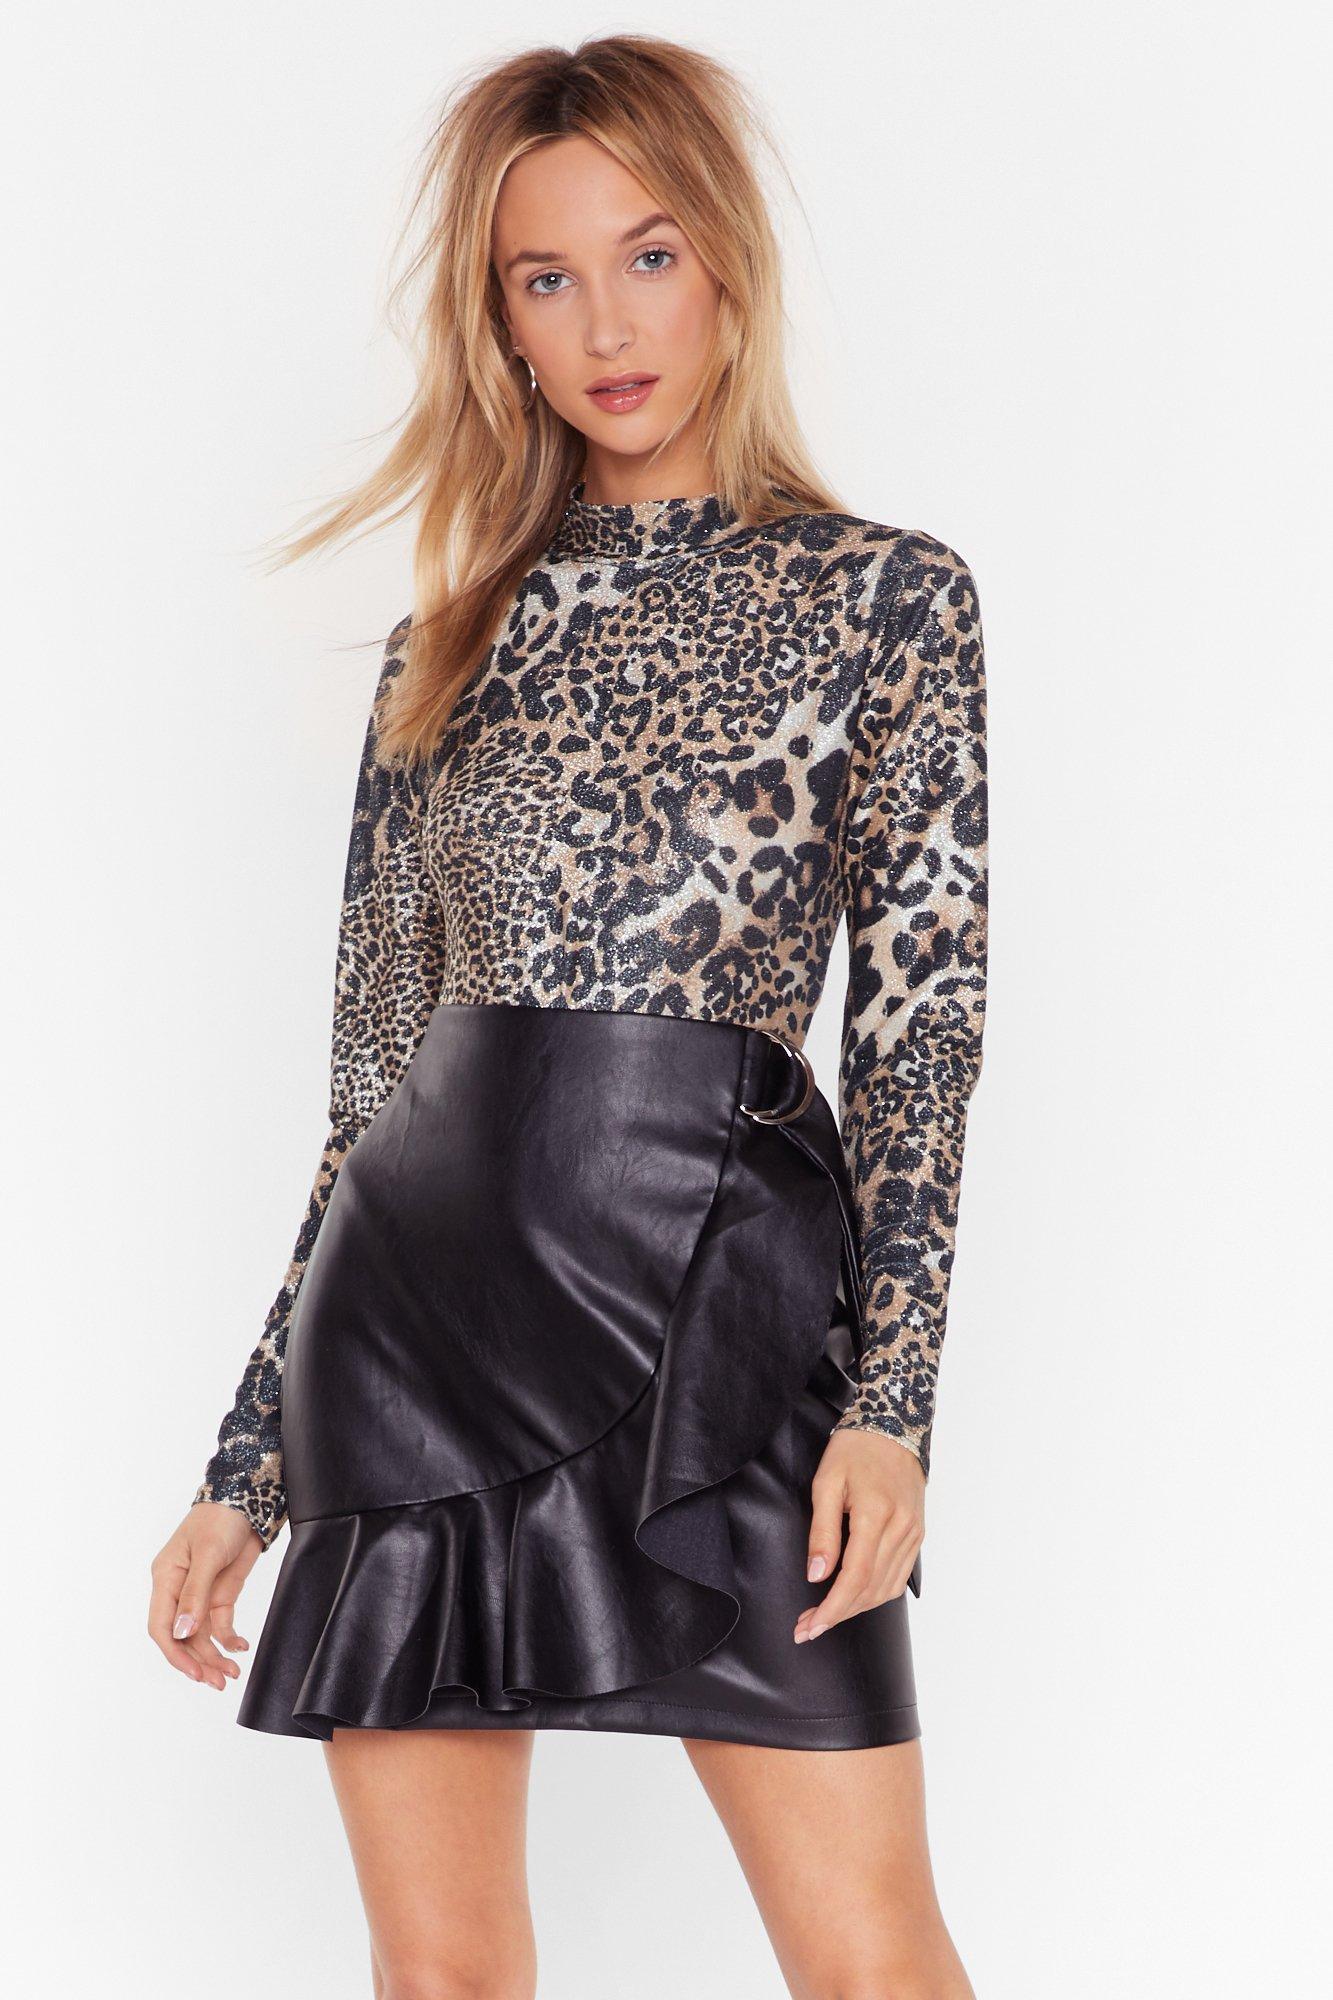 Image of Last Spotted Glitter Leopard Bodysuit